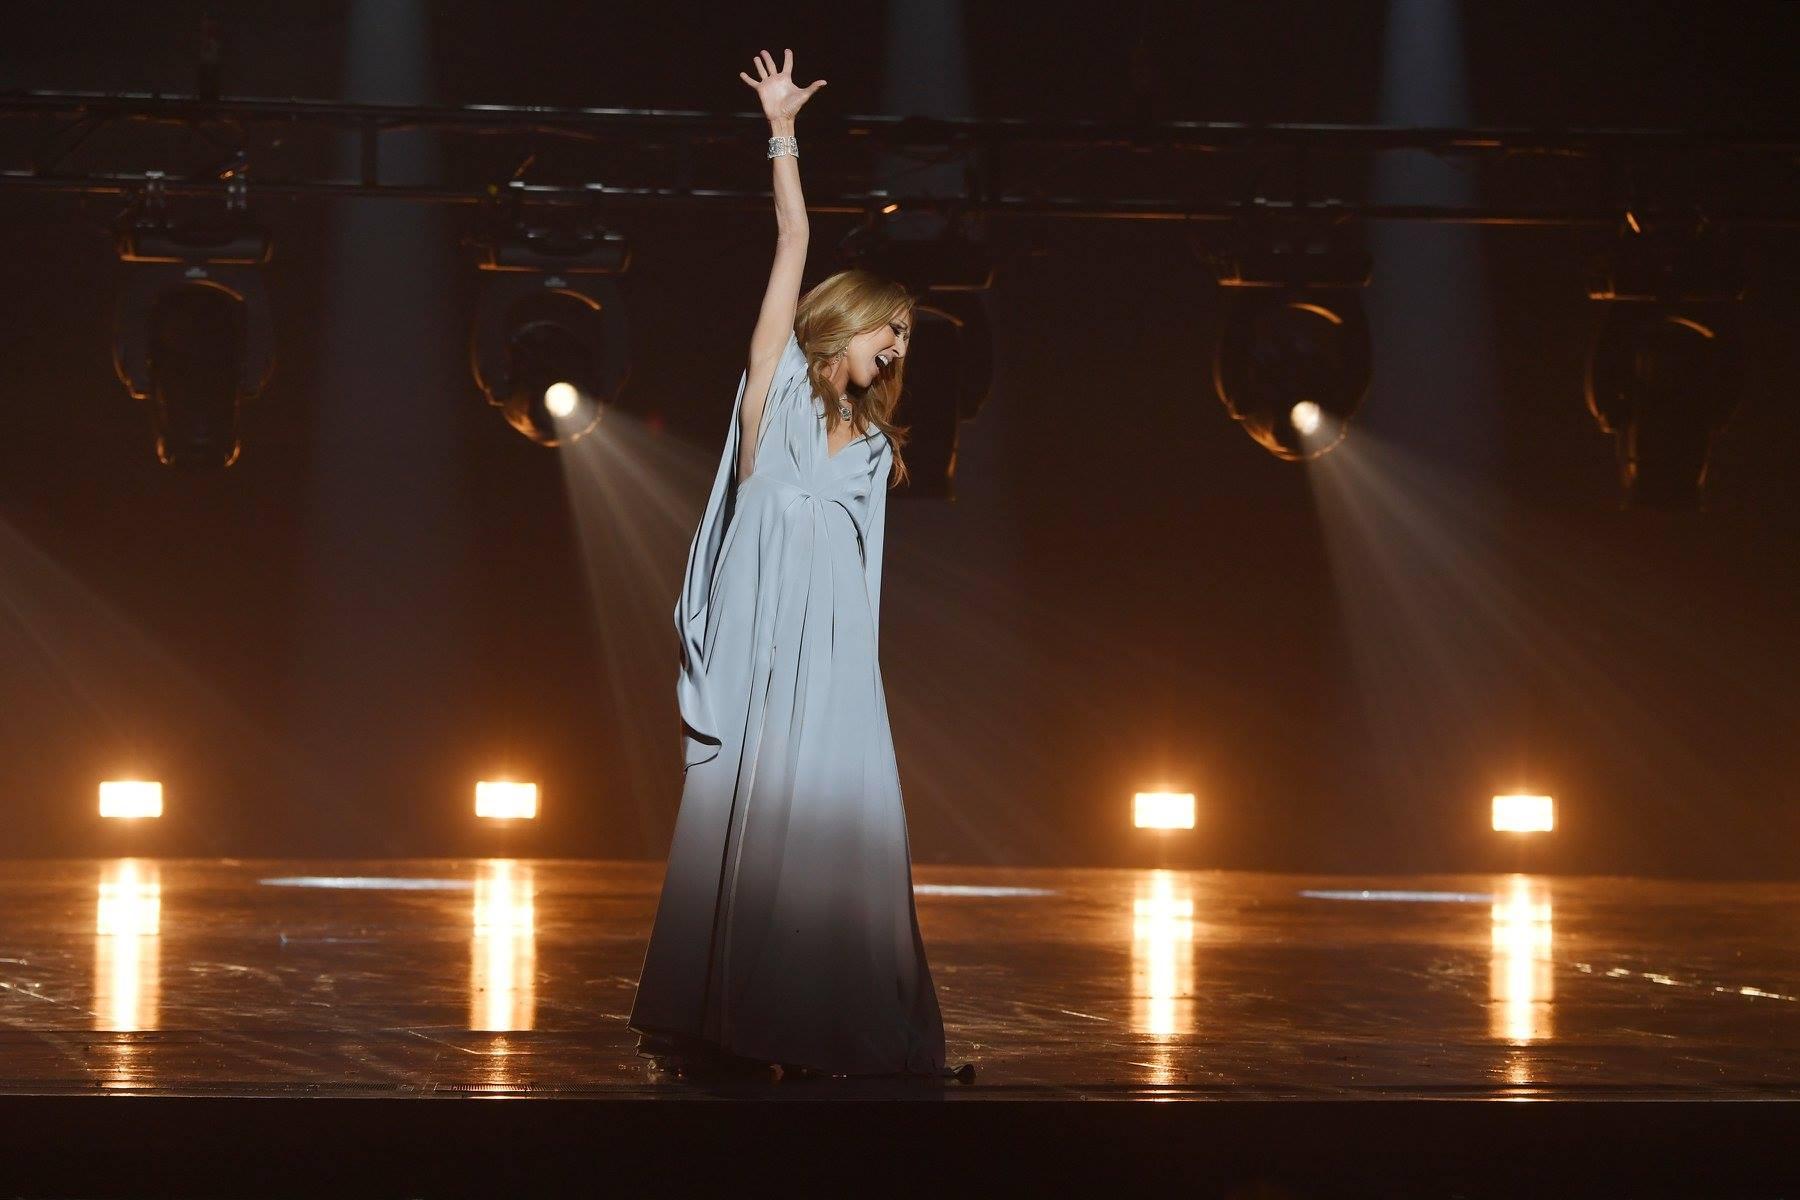 Chi è Céline Dion